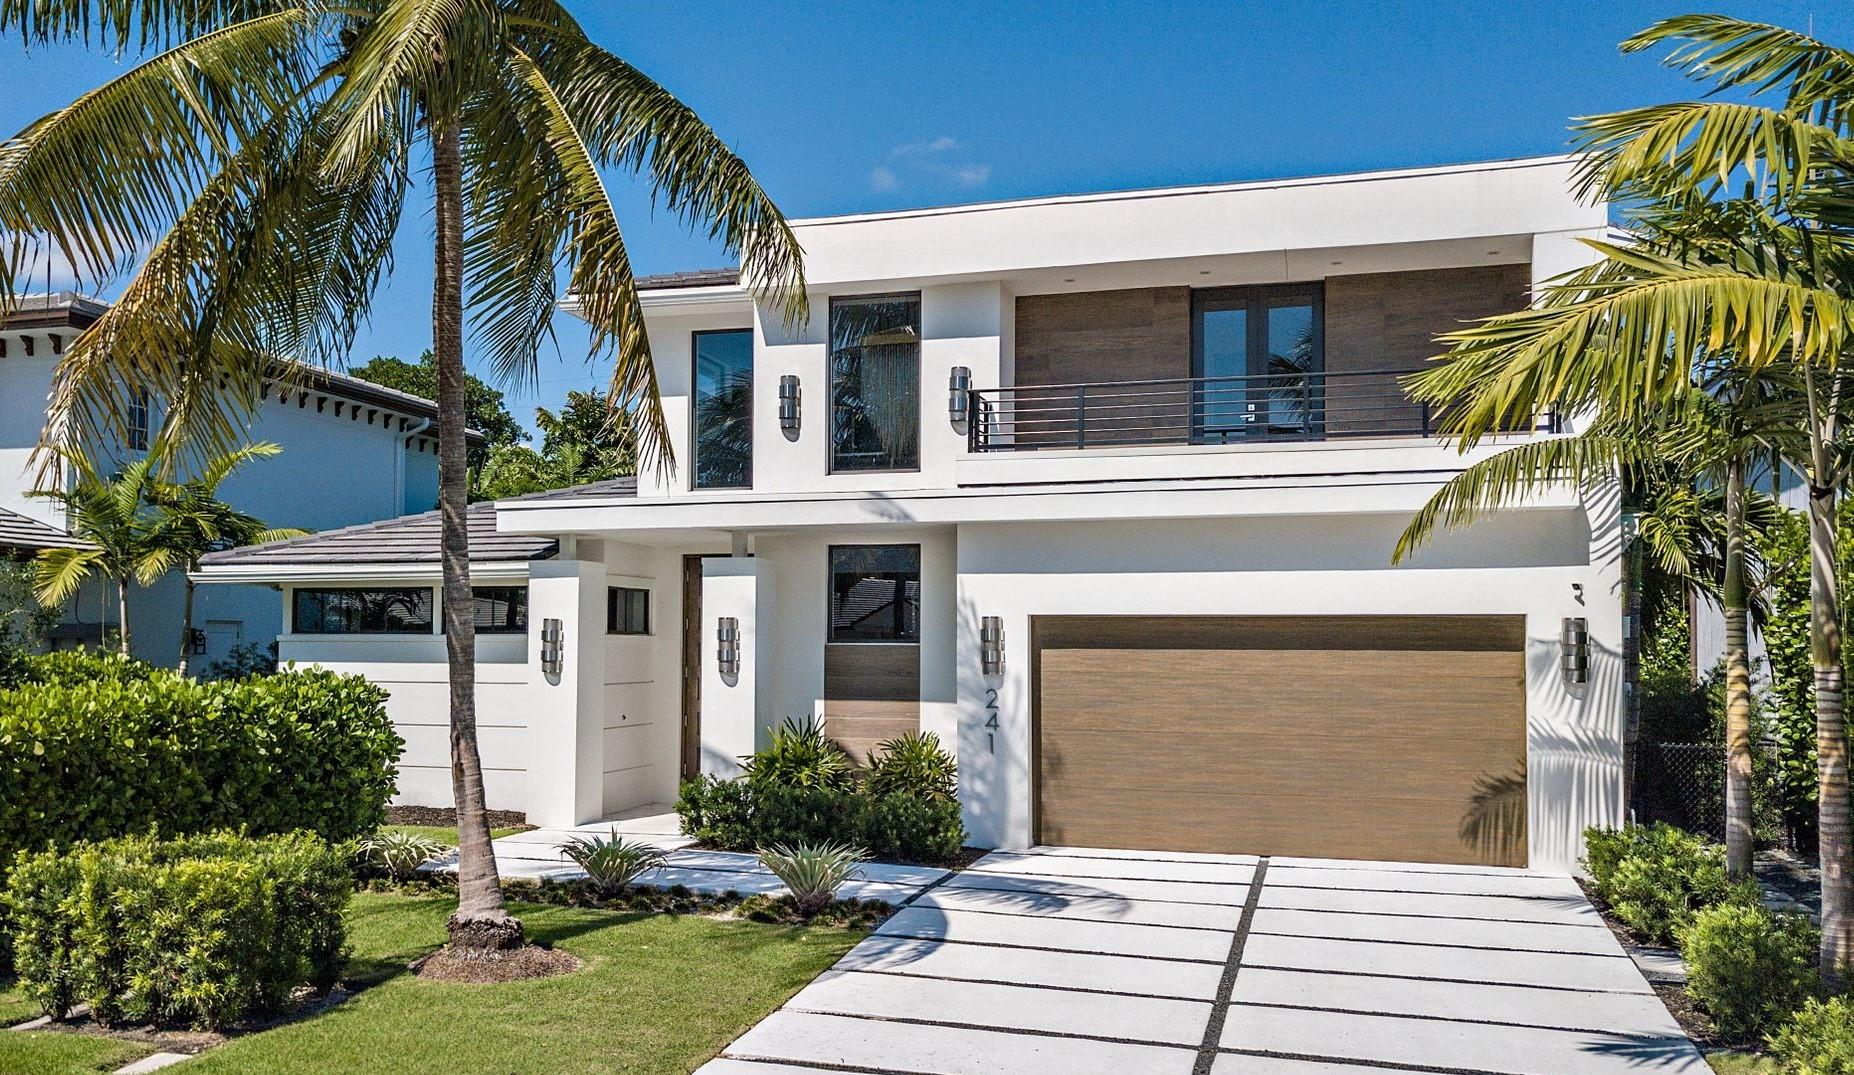 Details for 241 Edmor Road, West Palm Beach, FL 33405